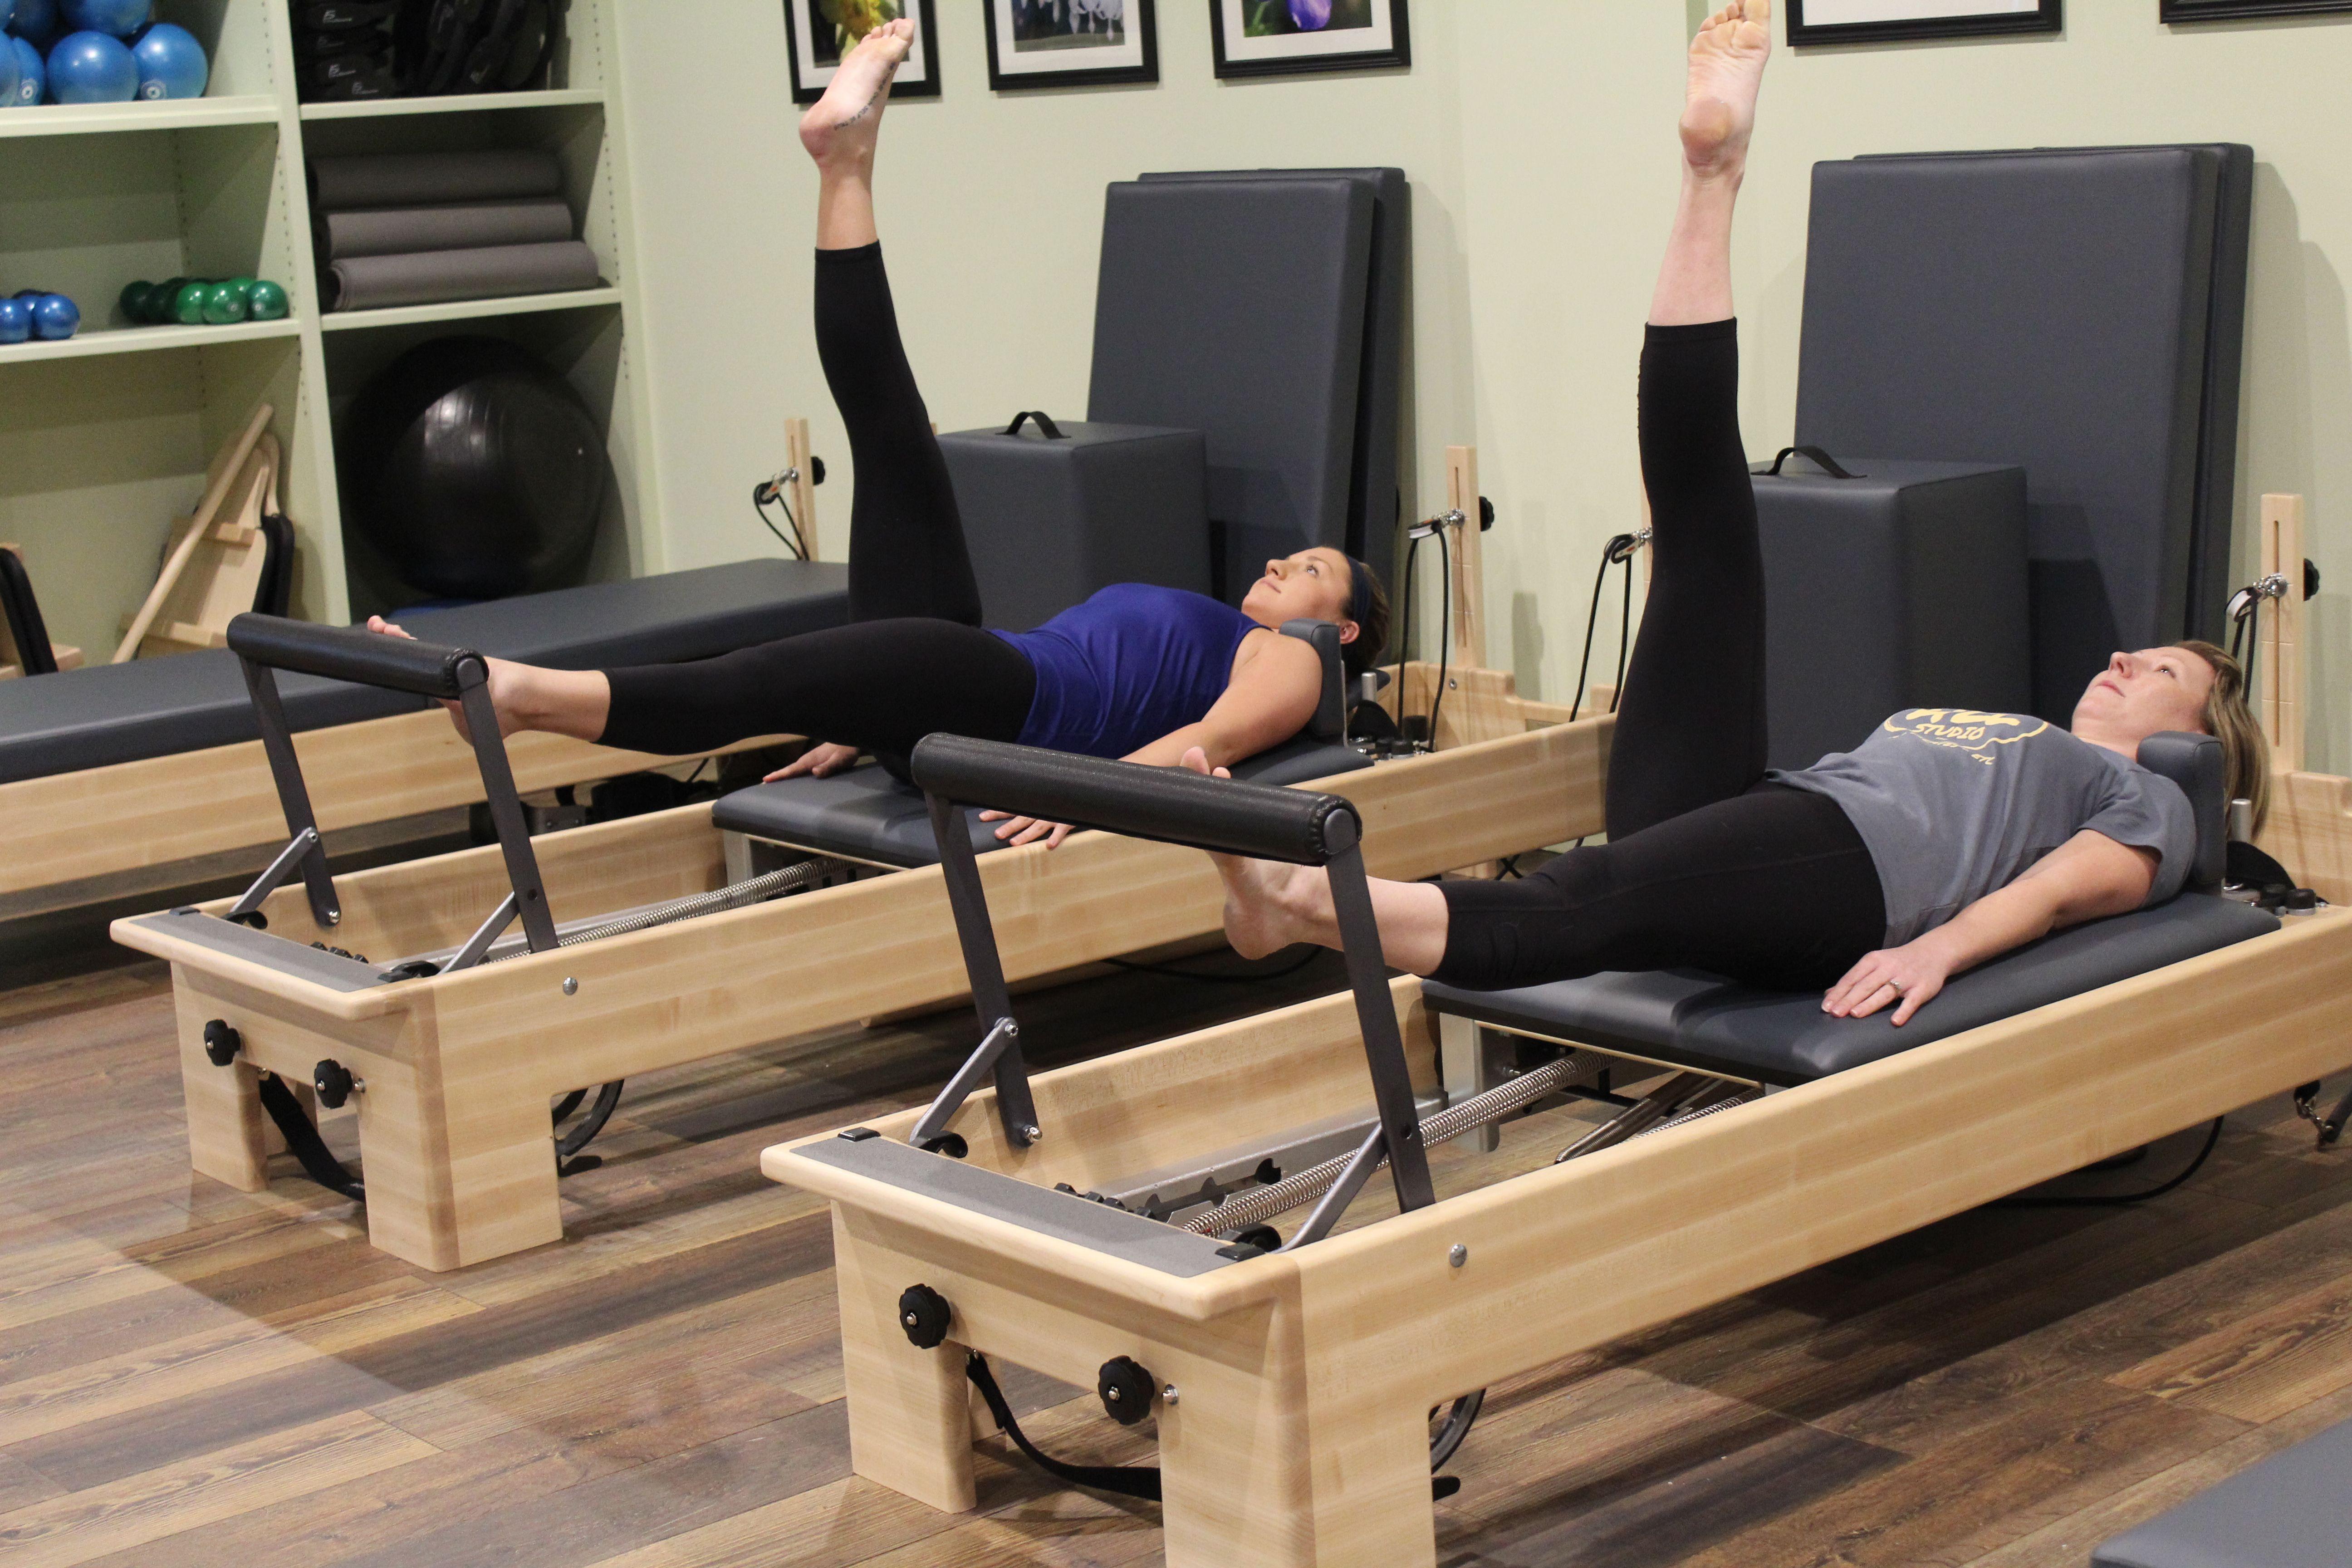 Pilates reformer classes mechanicsburg pilates